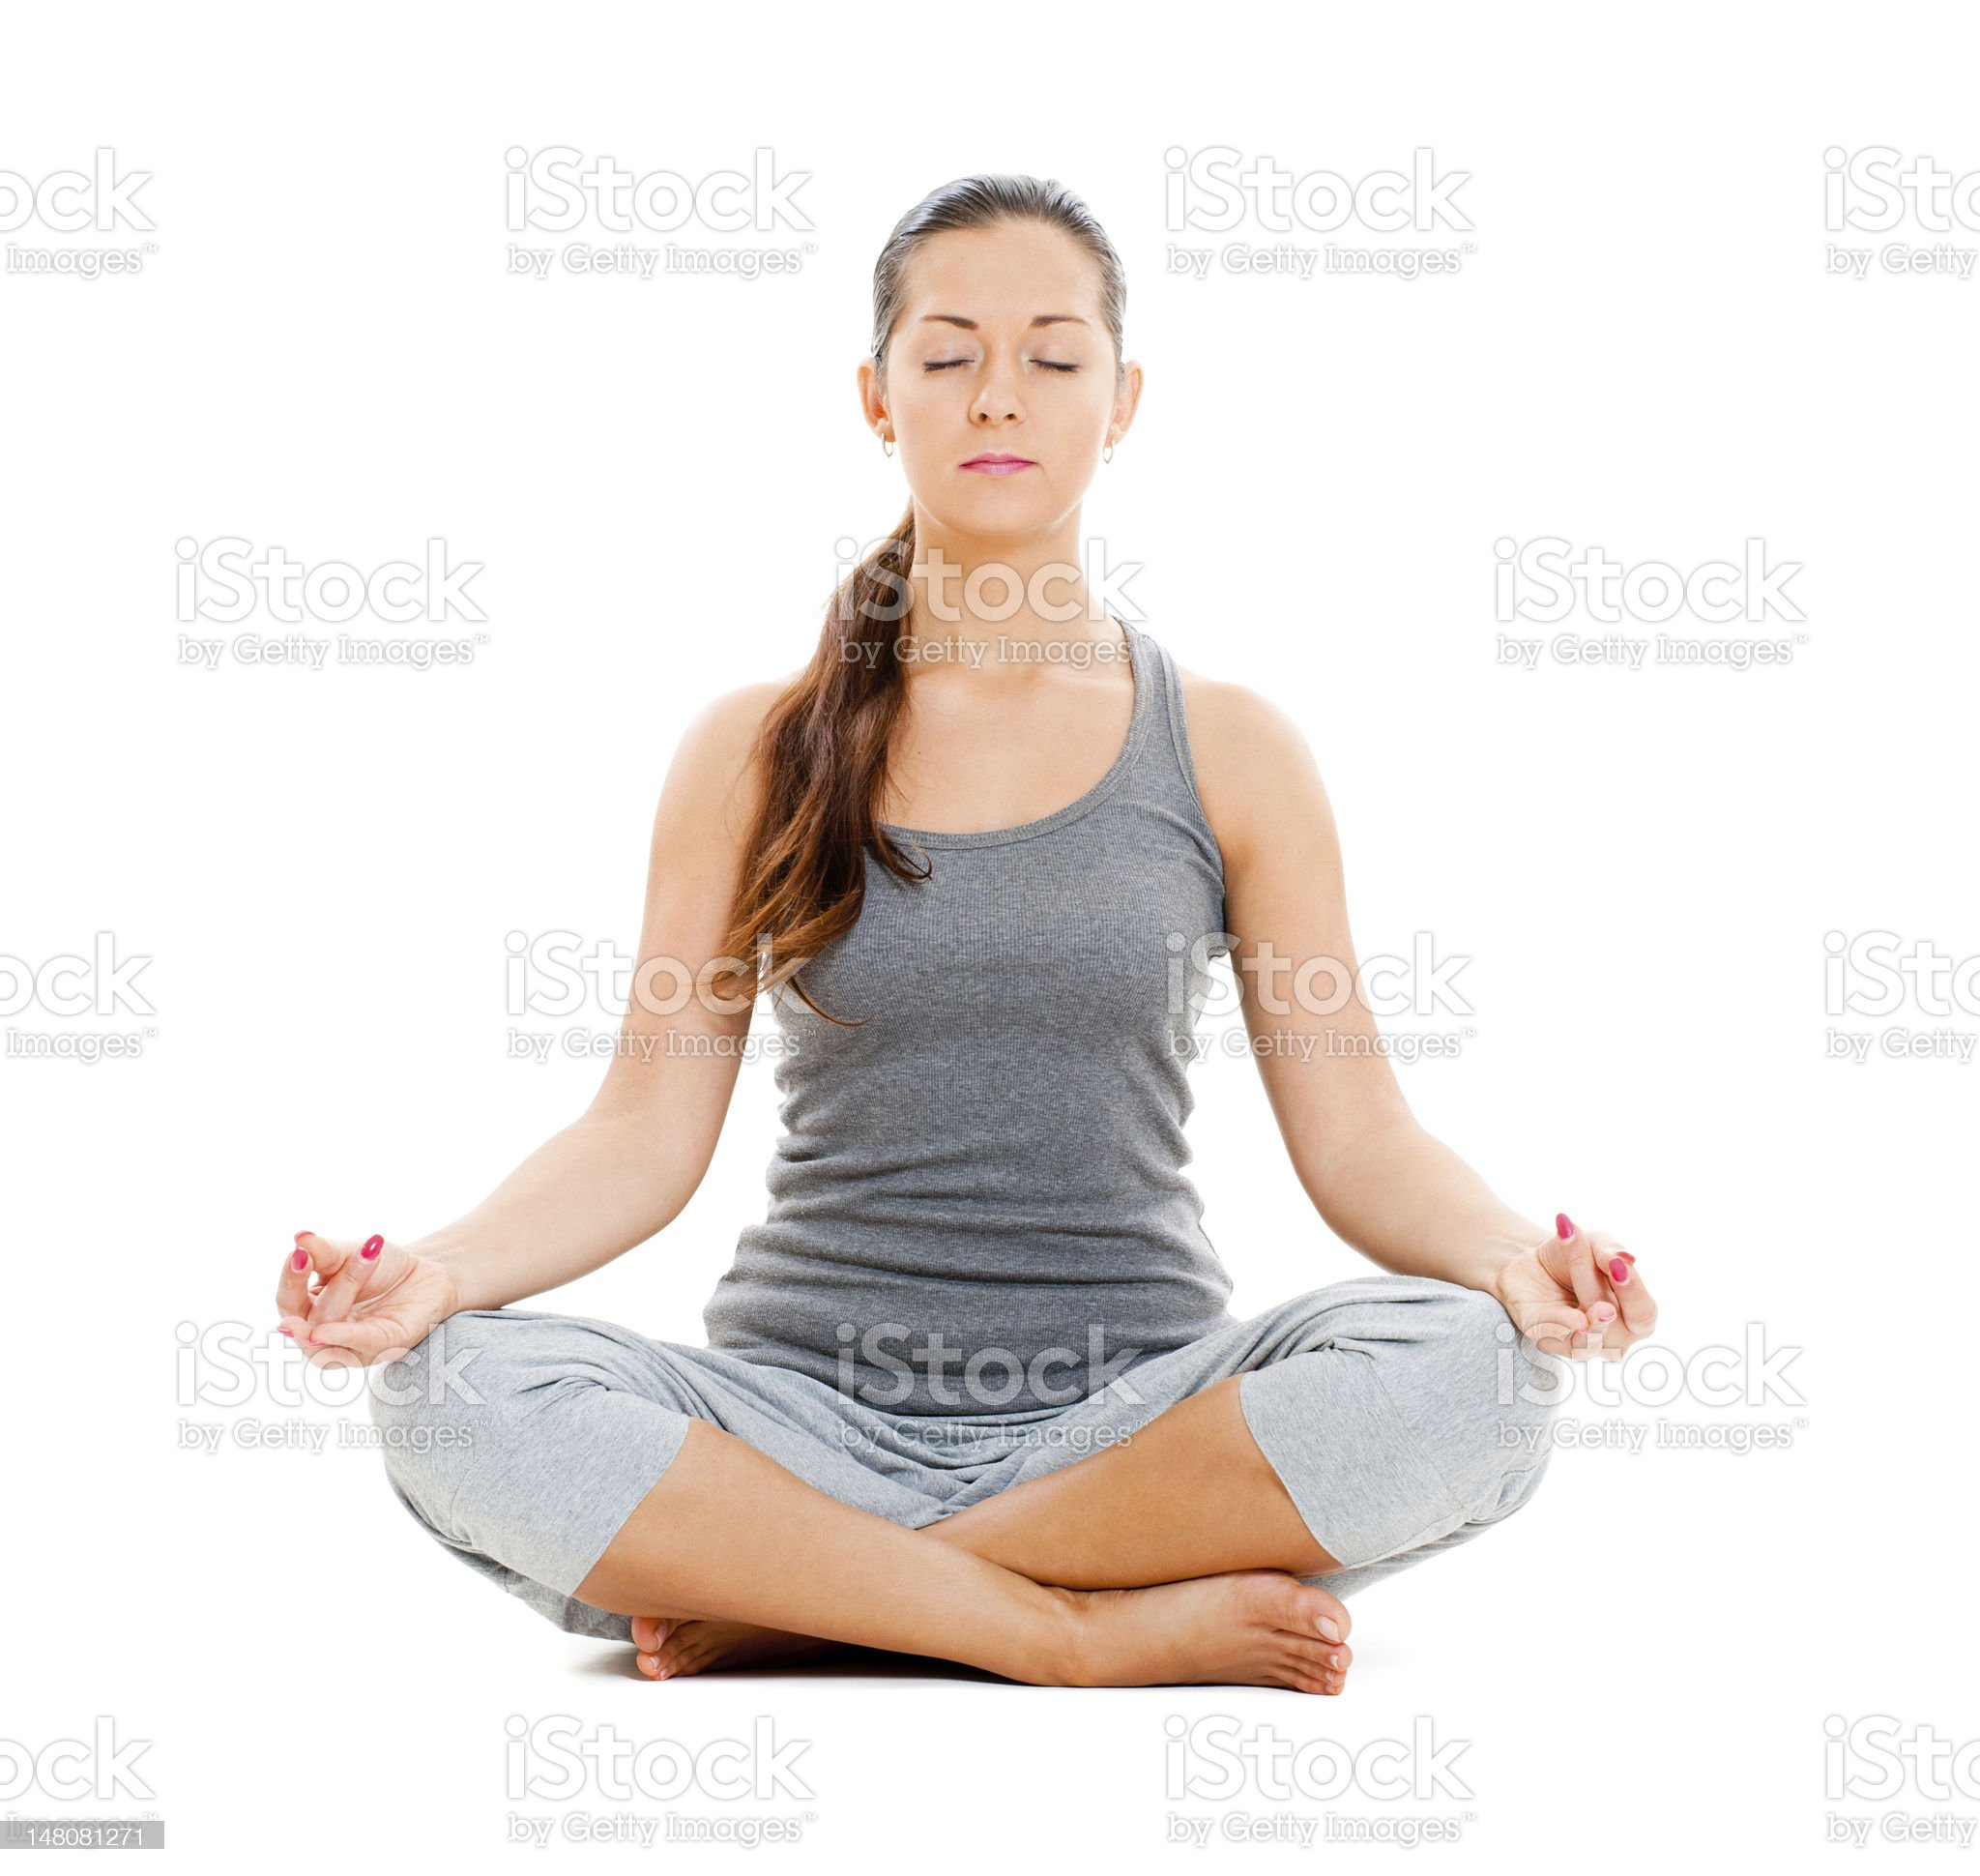 pretty woman doing yoga exercise royalty-free stock photo